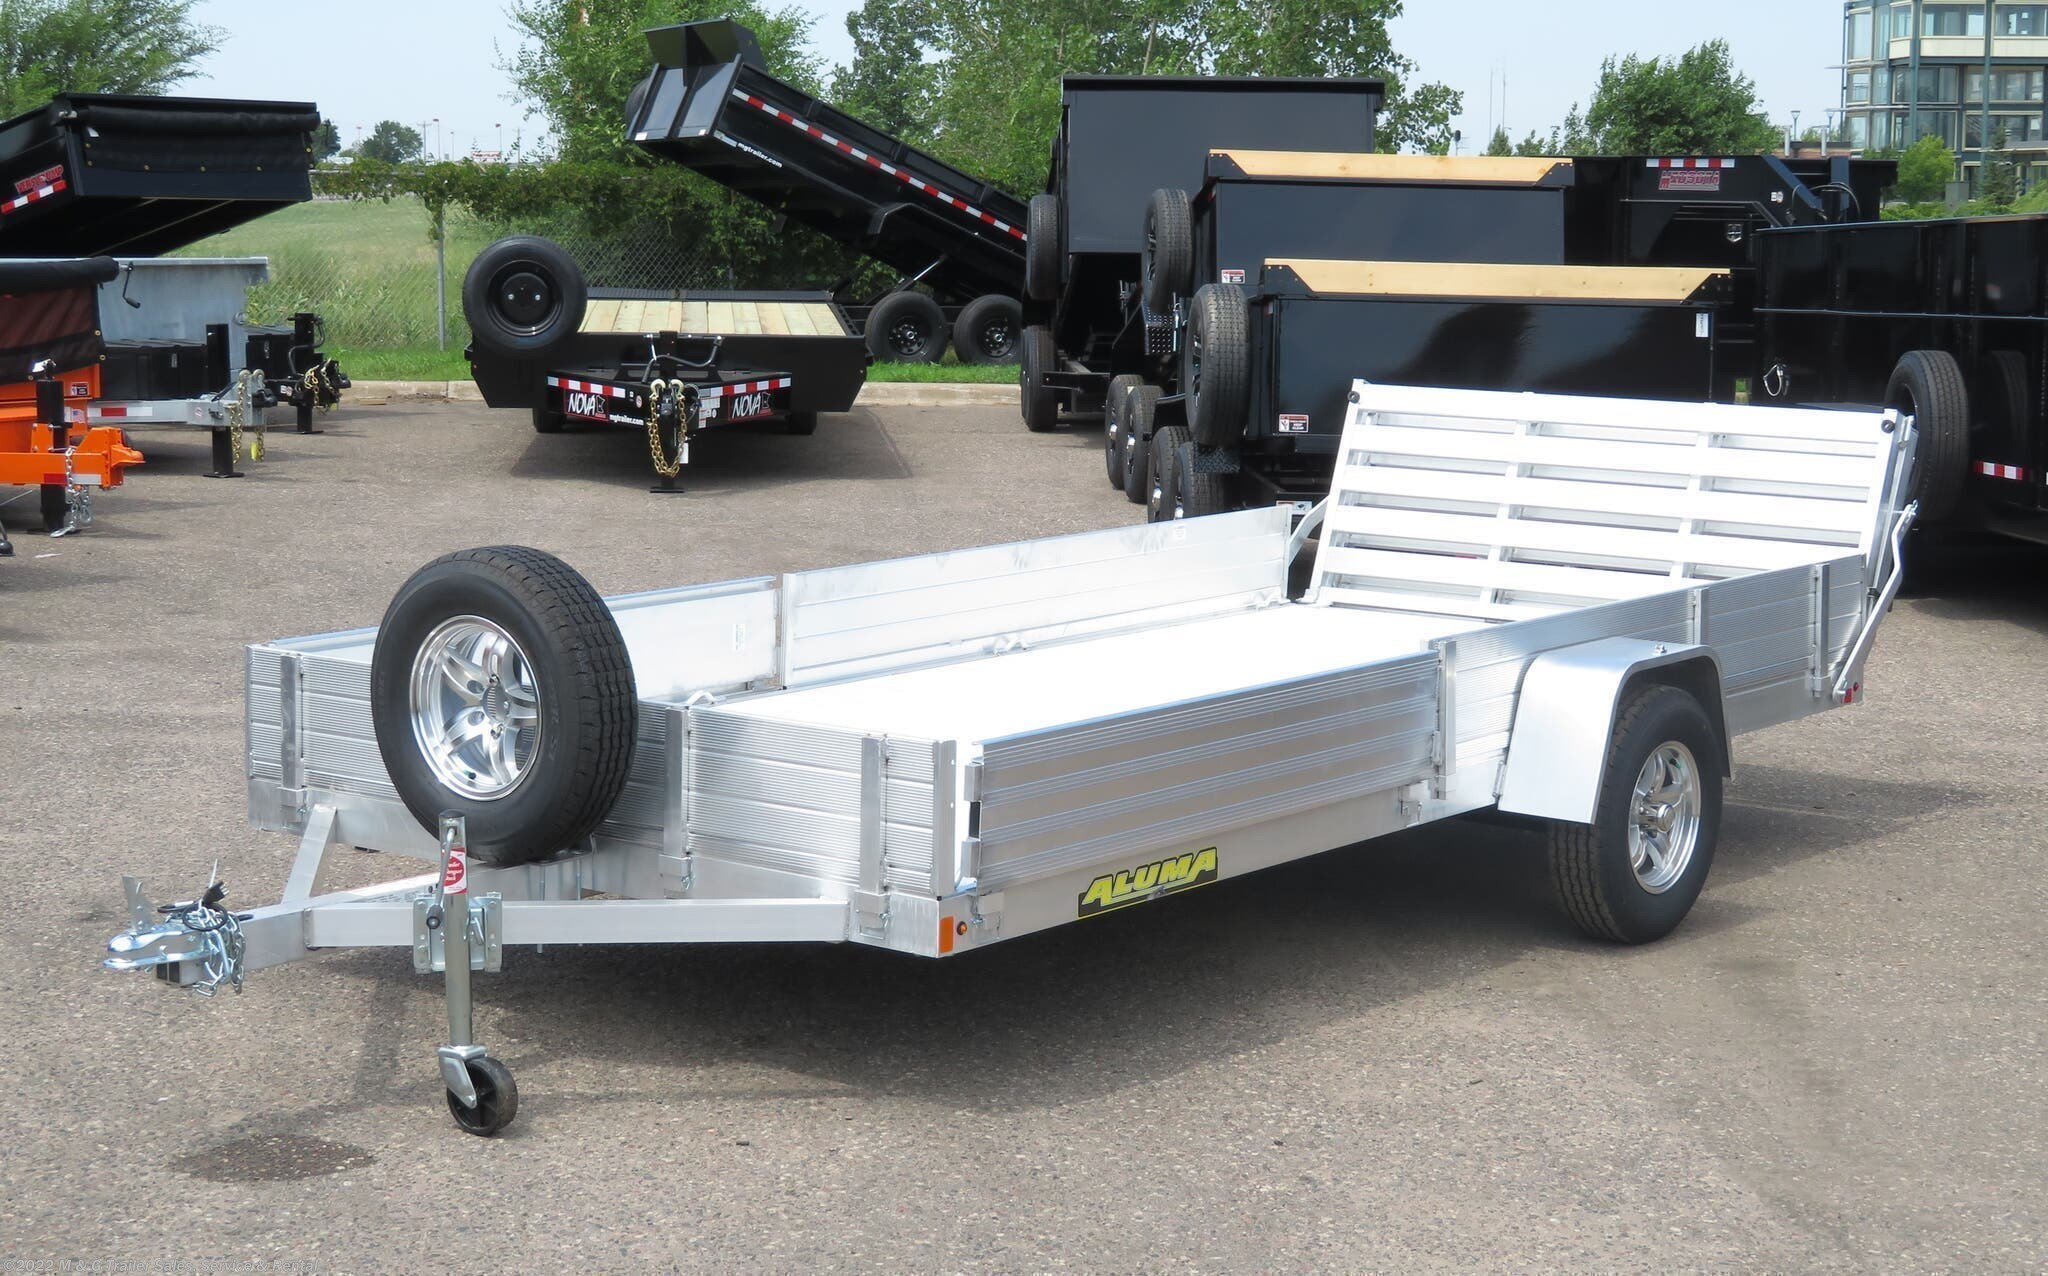 2021 Aluma 8114 SR Aluminum ATV/Utility Trailer - Stock #227081